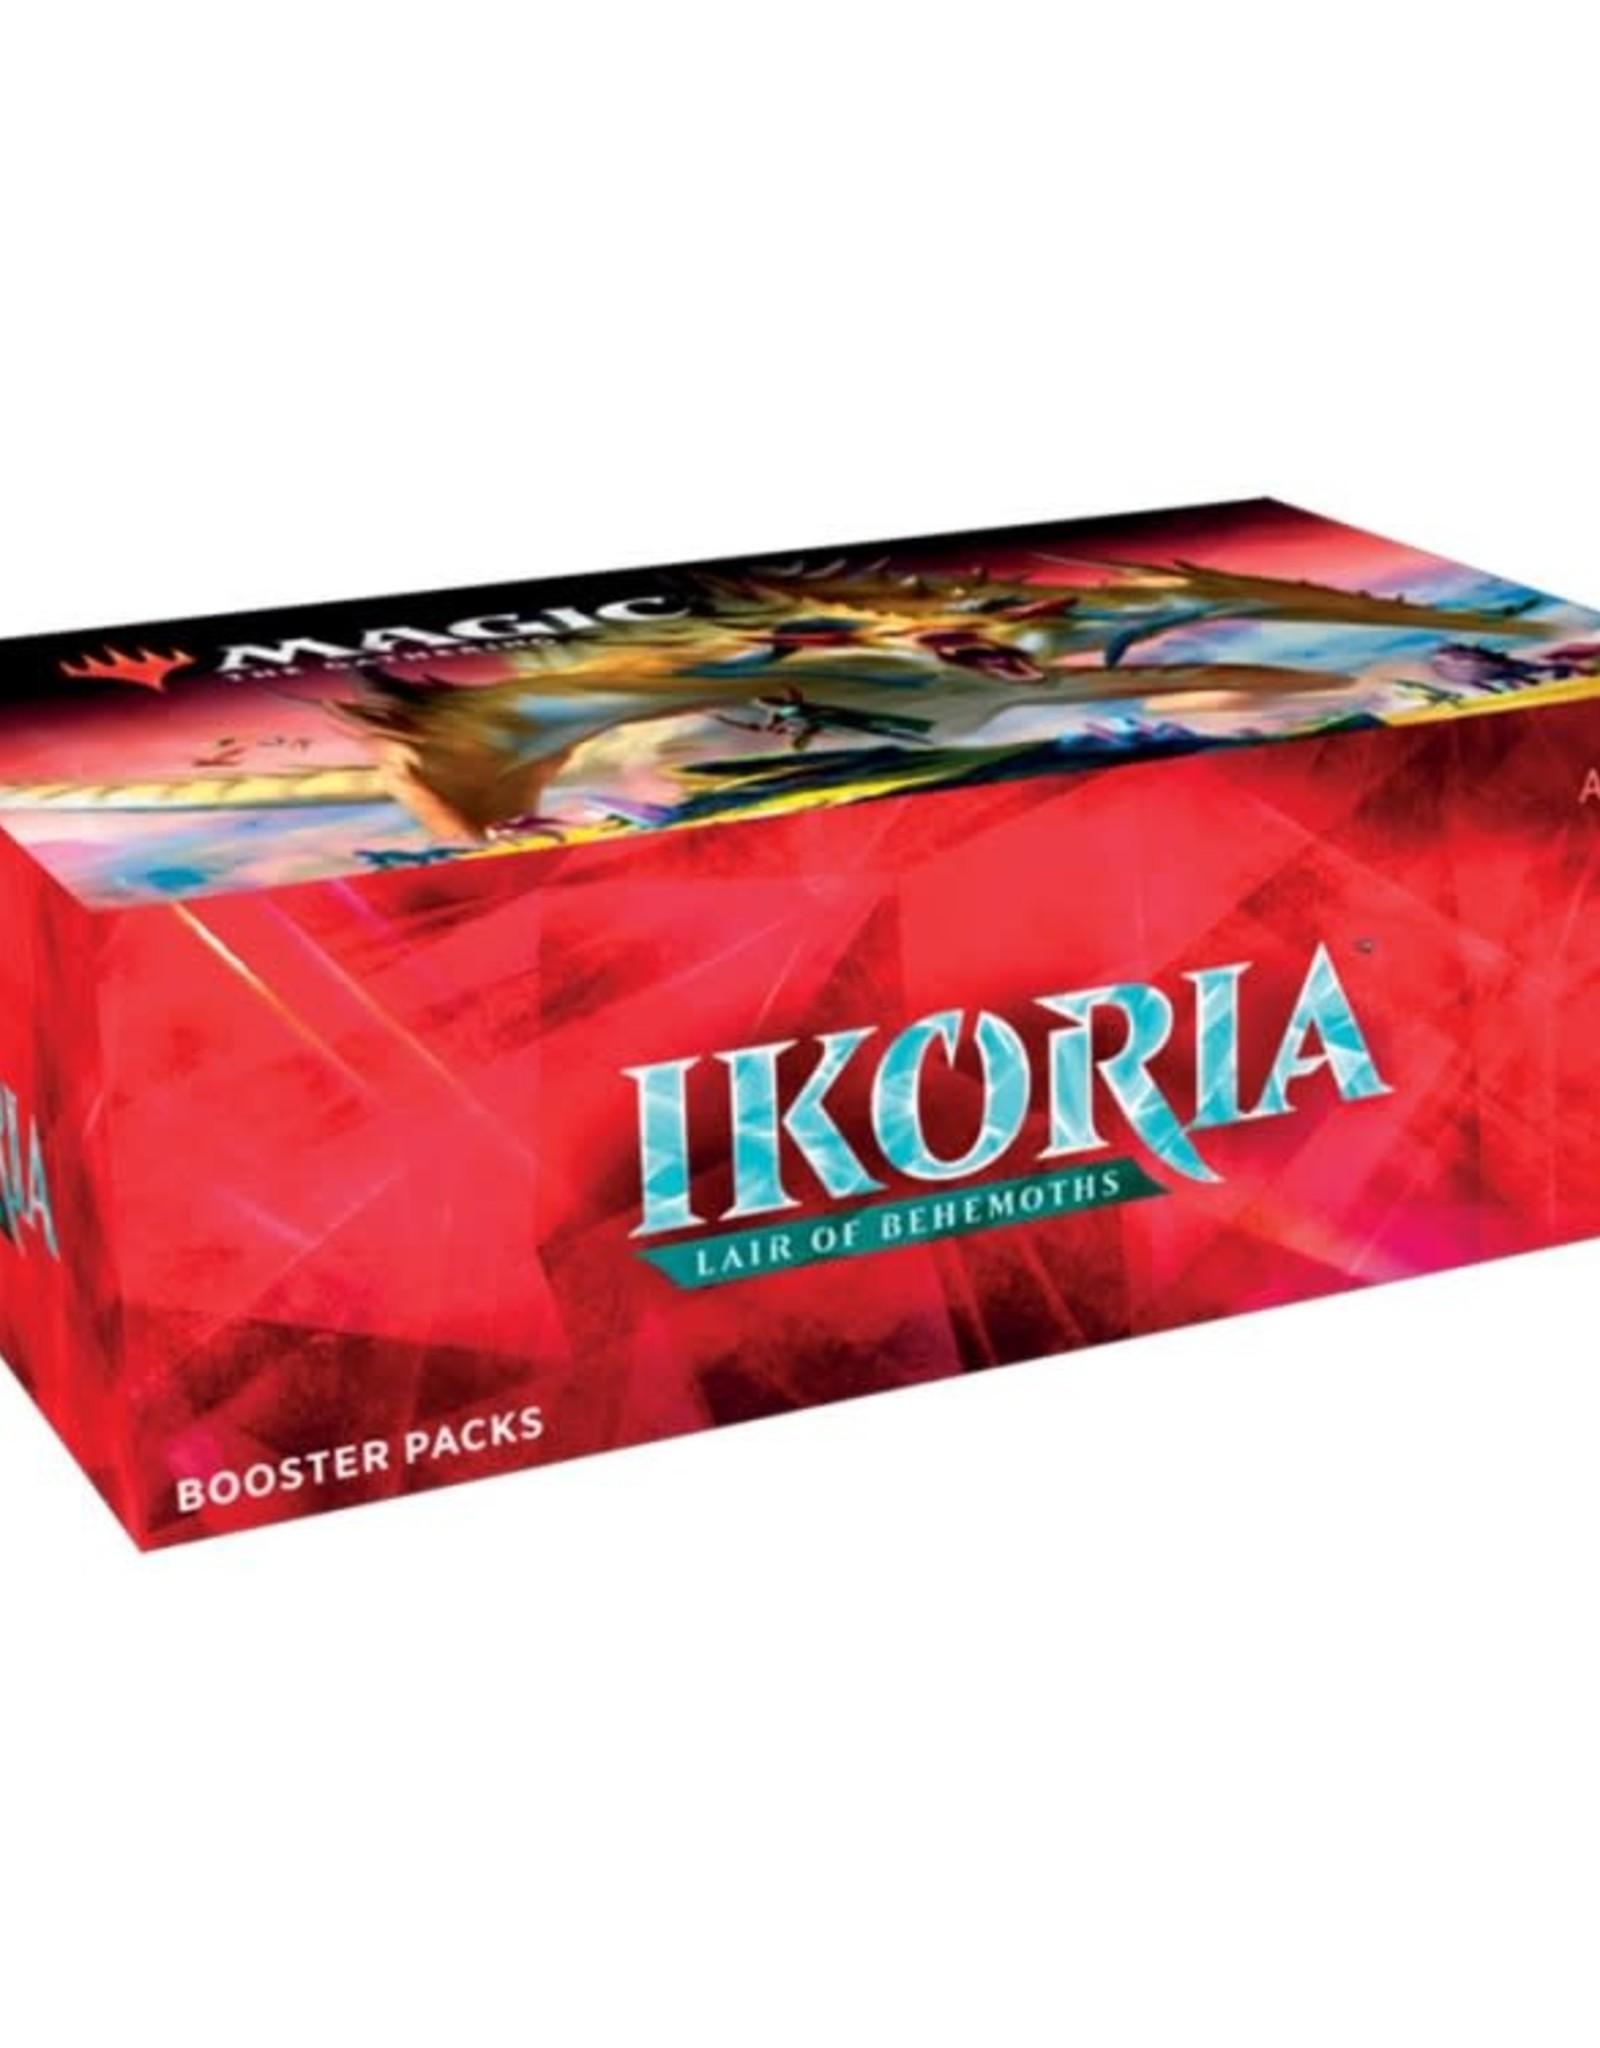 WOTC MTG Booster Box: Ikoria - Lair of Behemoths (36 Packs)